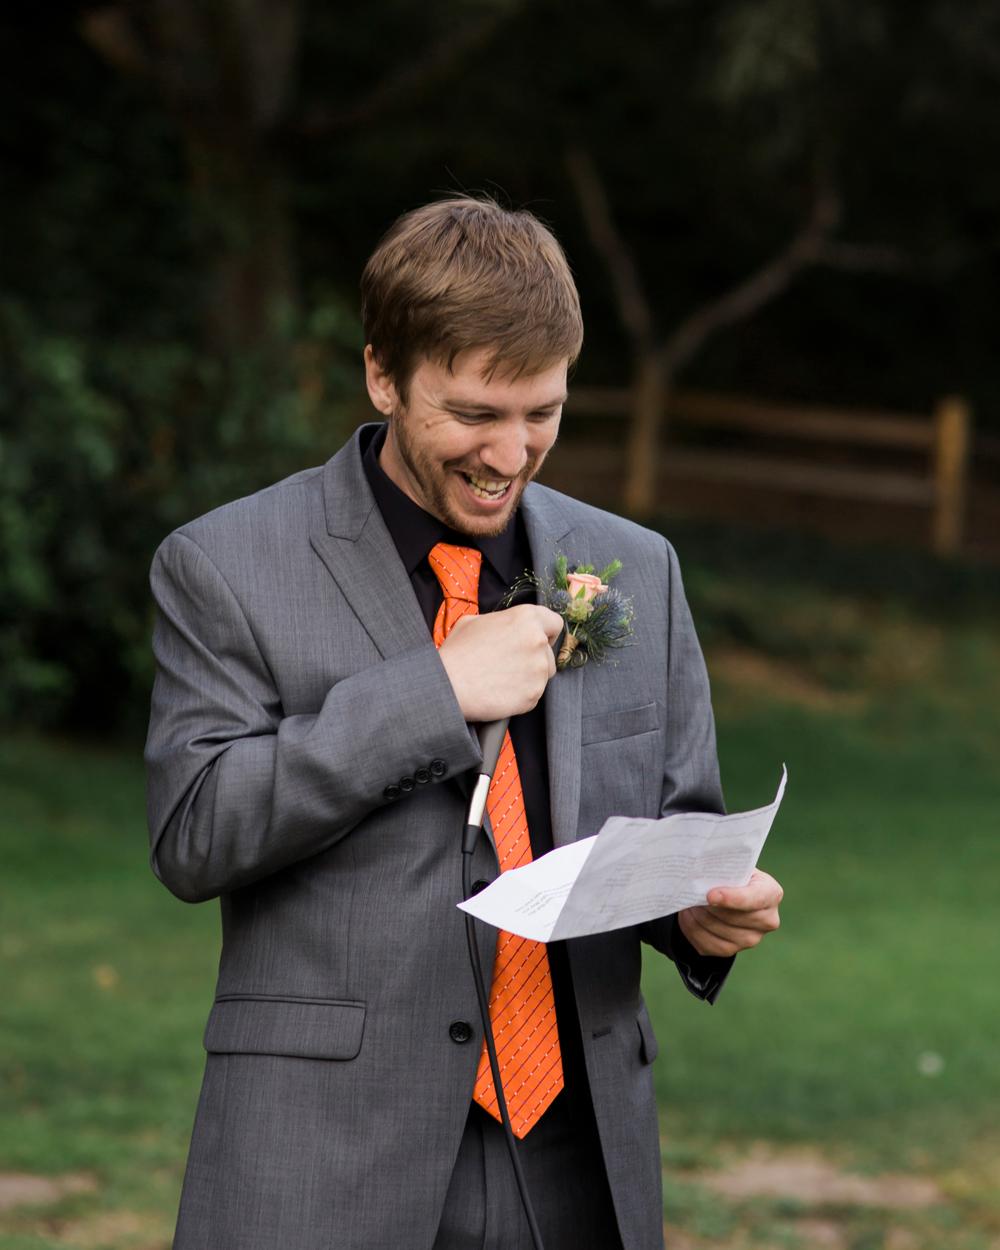 aptos-village-park-wedding-photography-lilouette-68.jpg